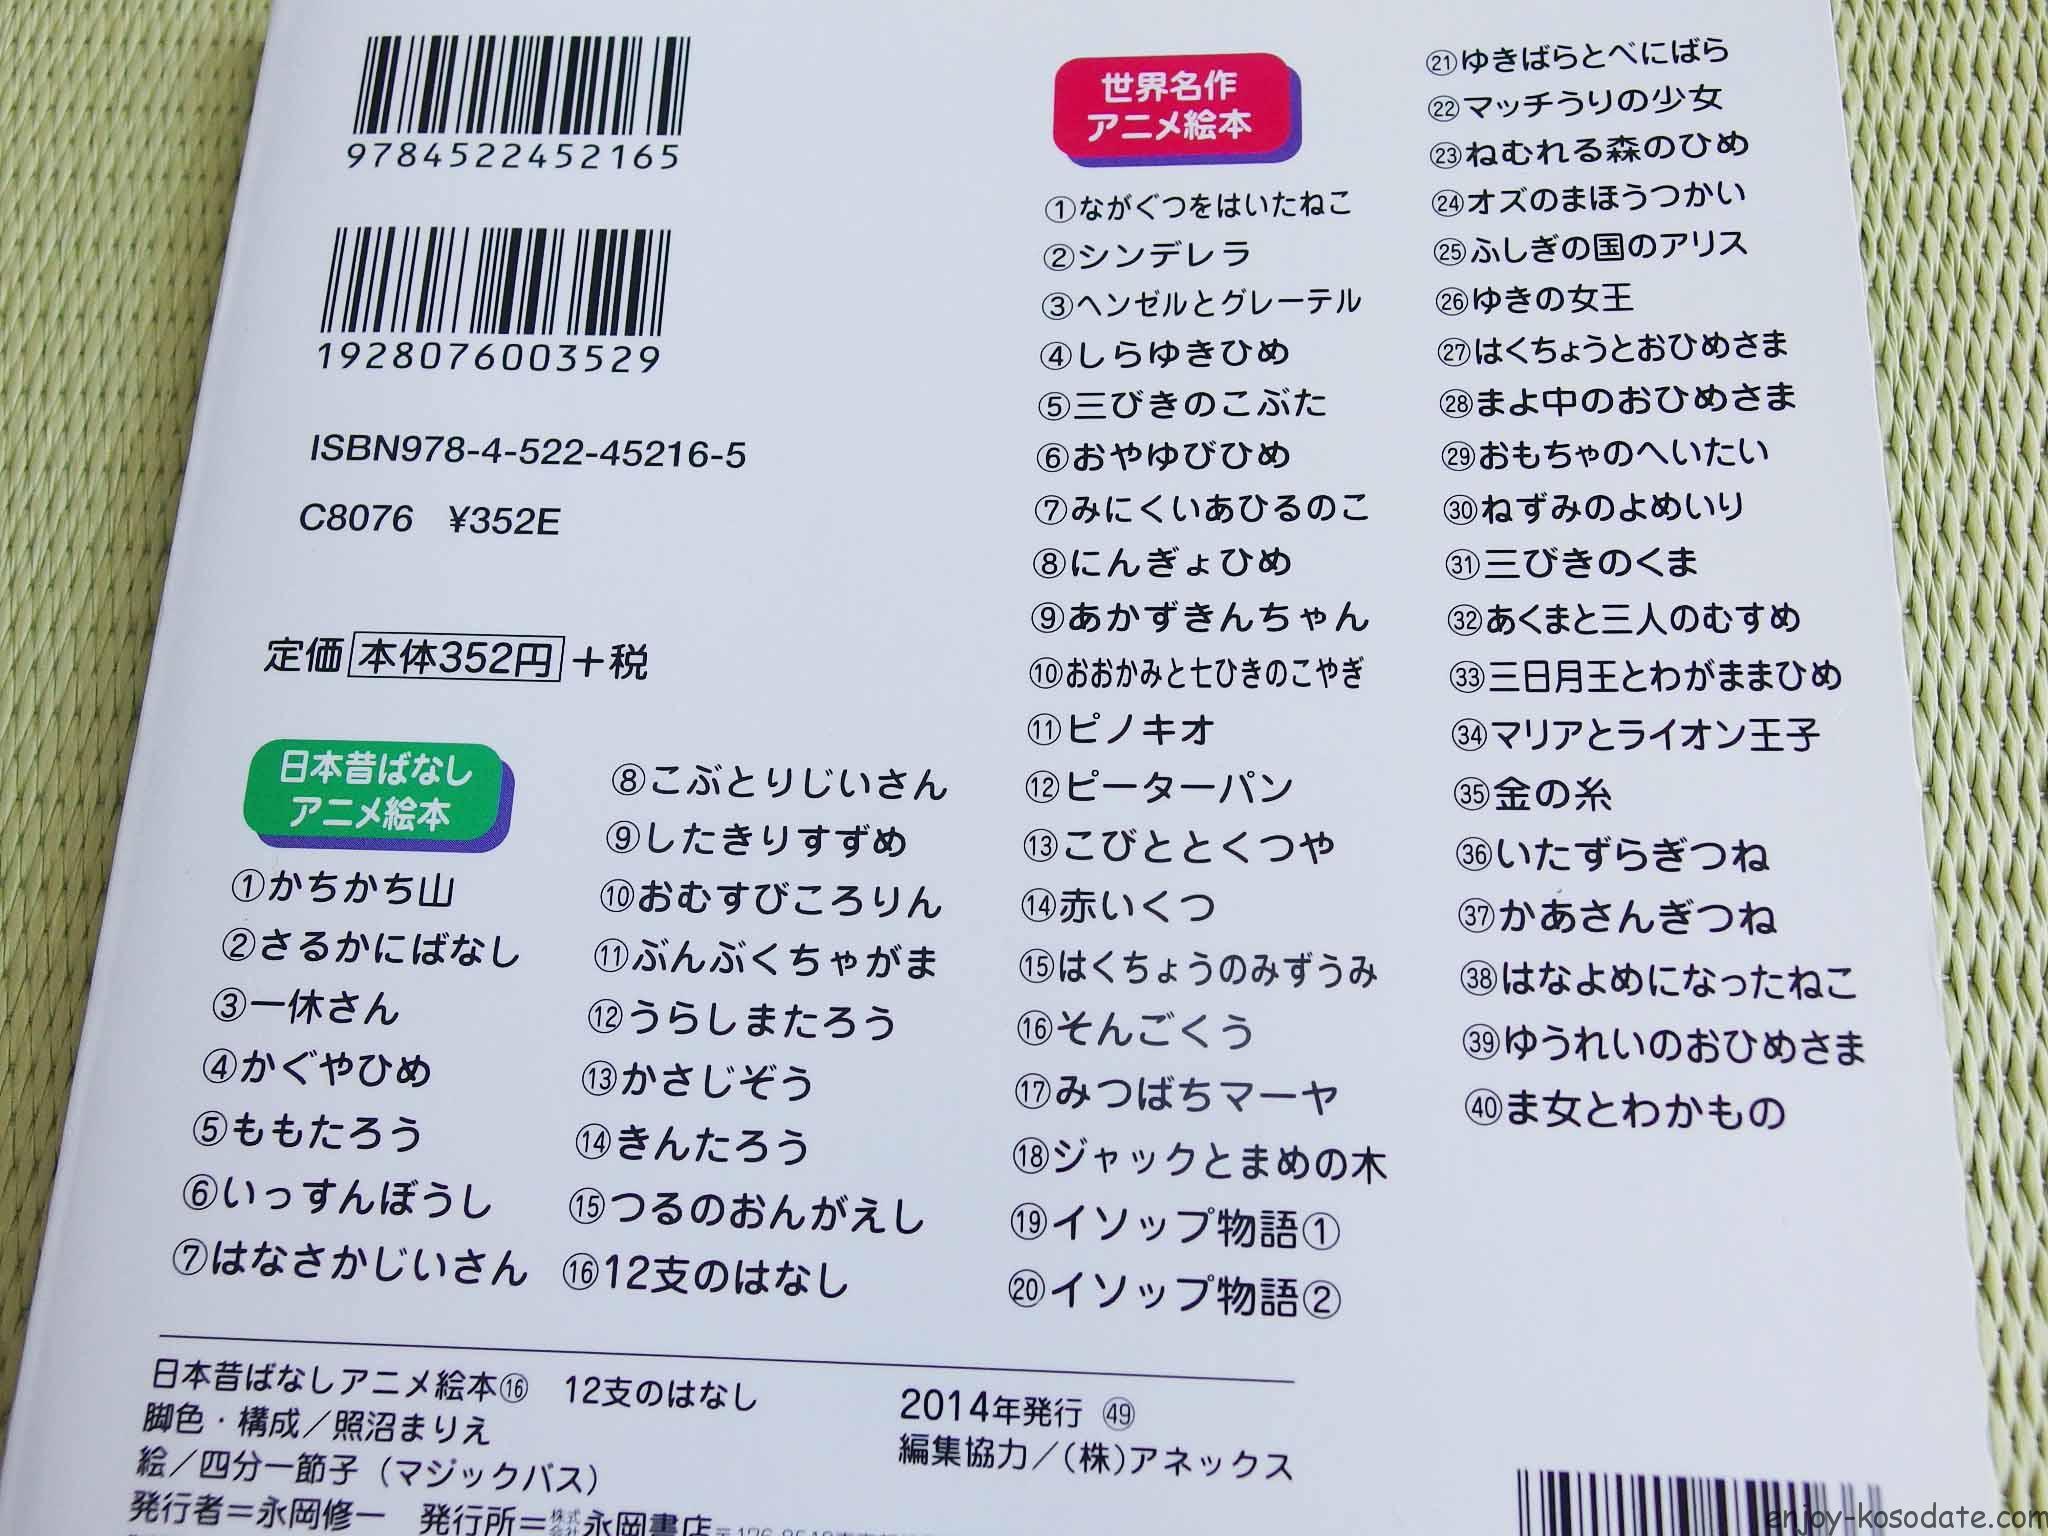 IMGP0551 - コピー